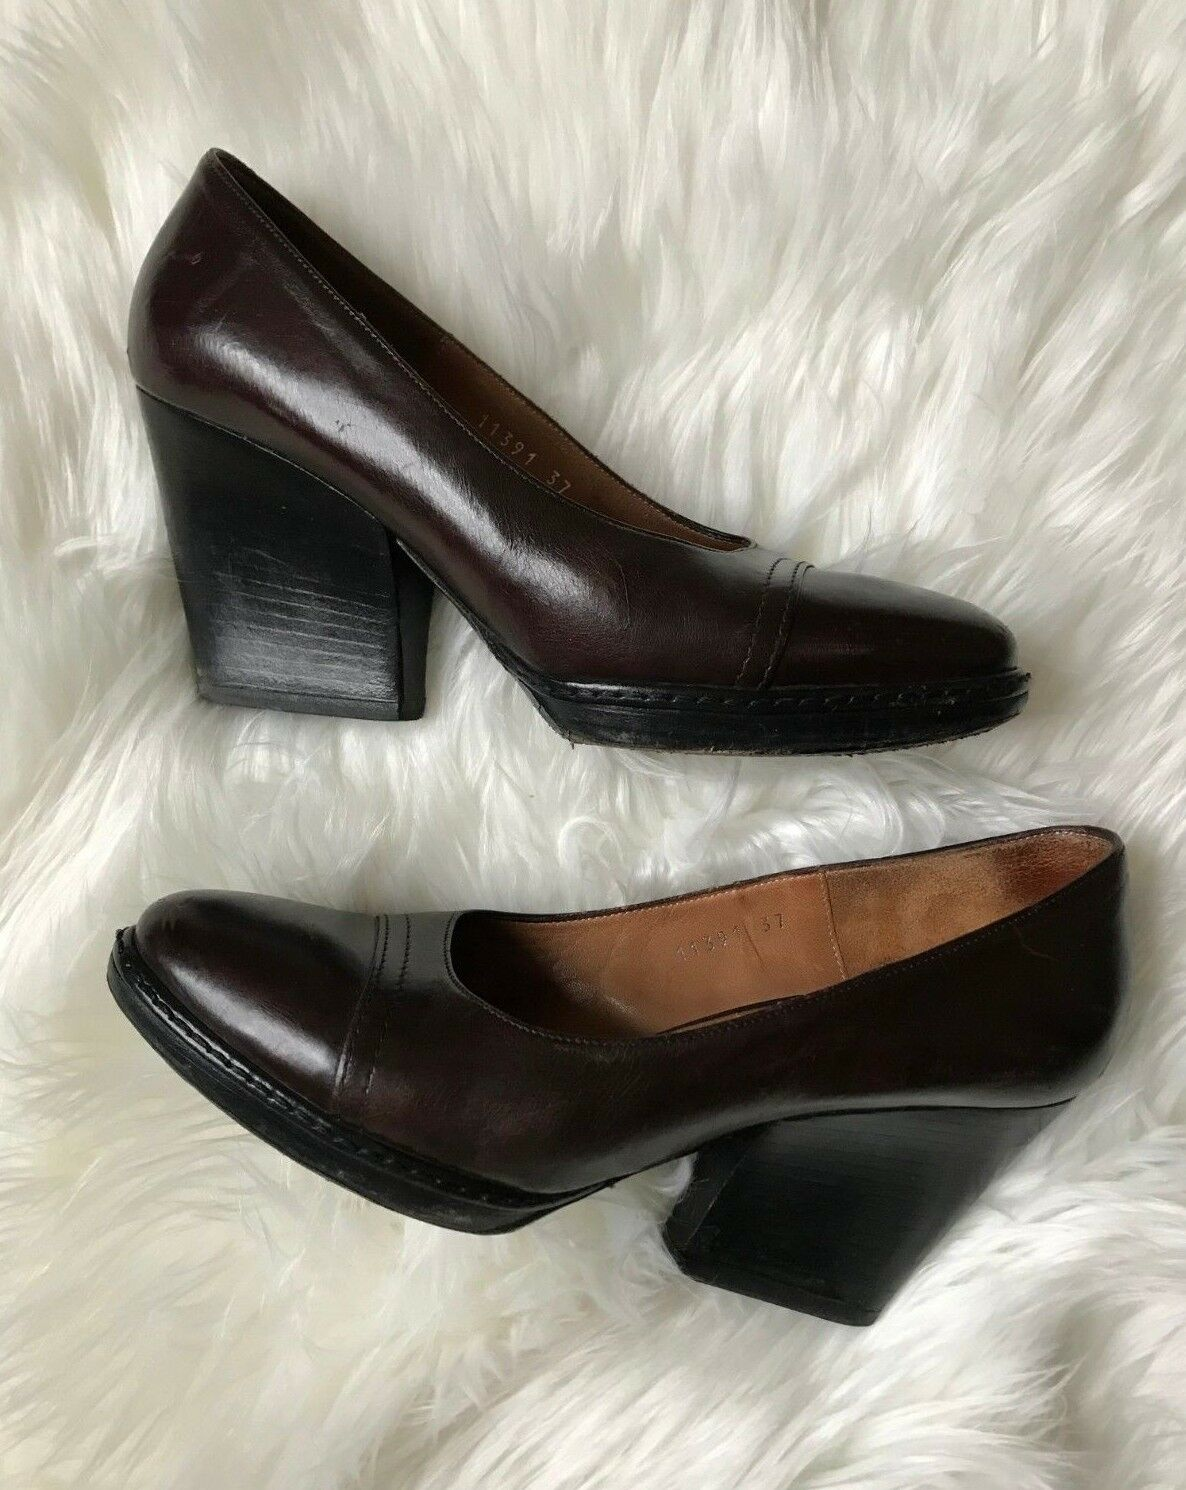 Dries Van Noten Size 37 Dark Red Brown Two Tone Leather Slanted Block Heels